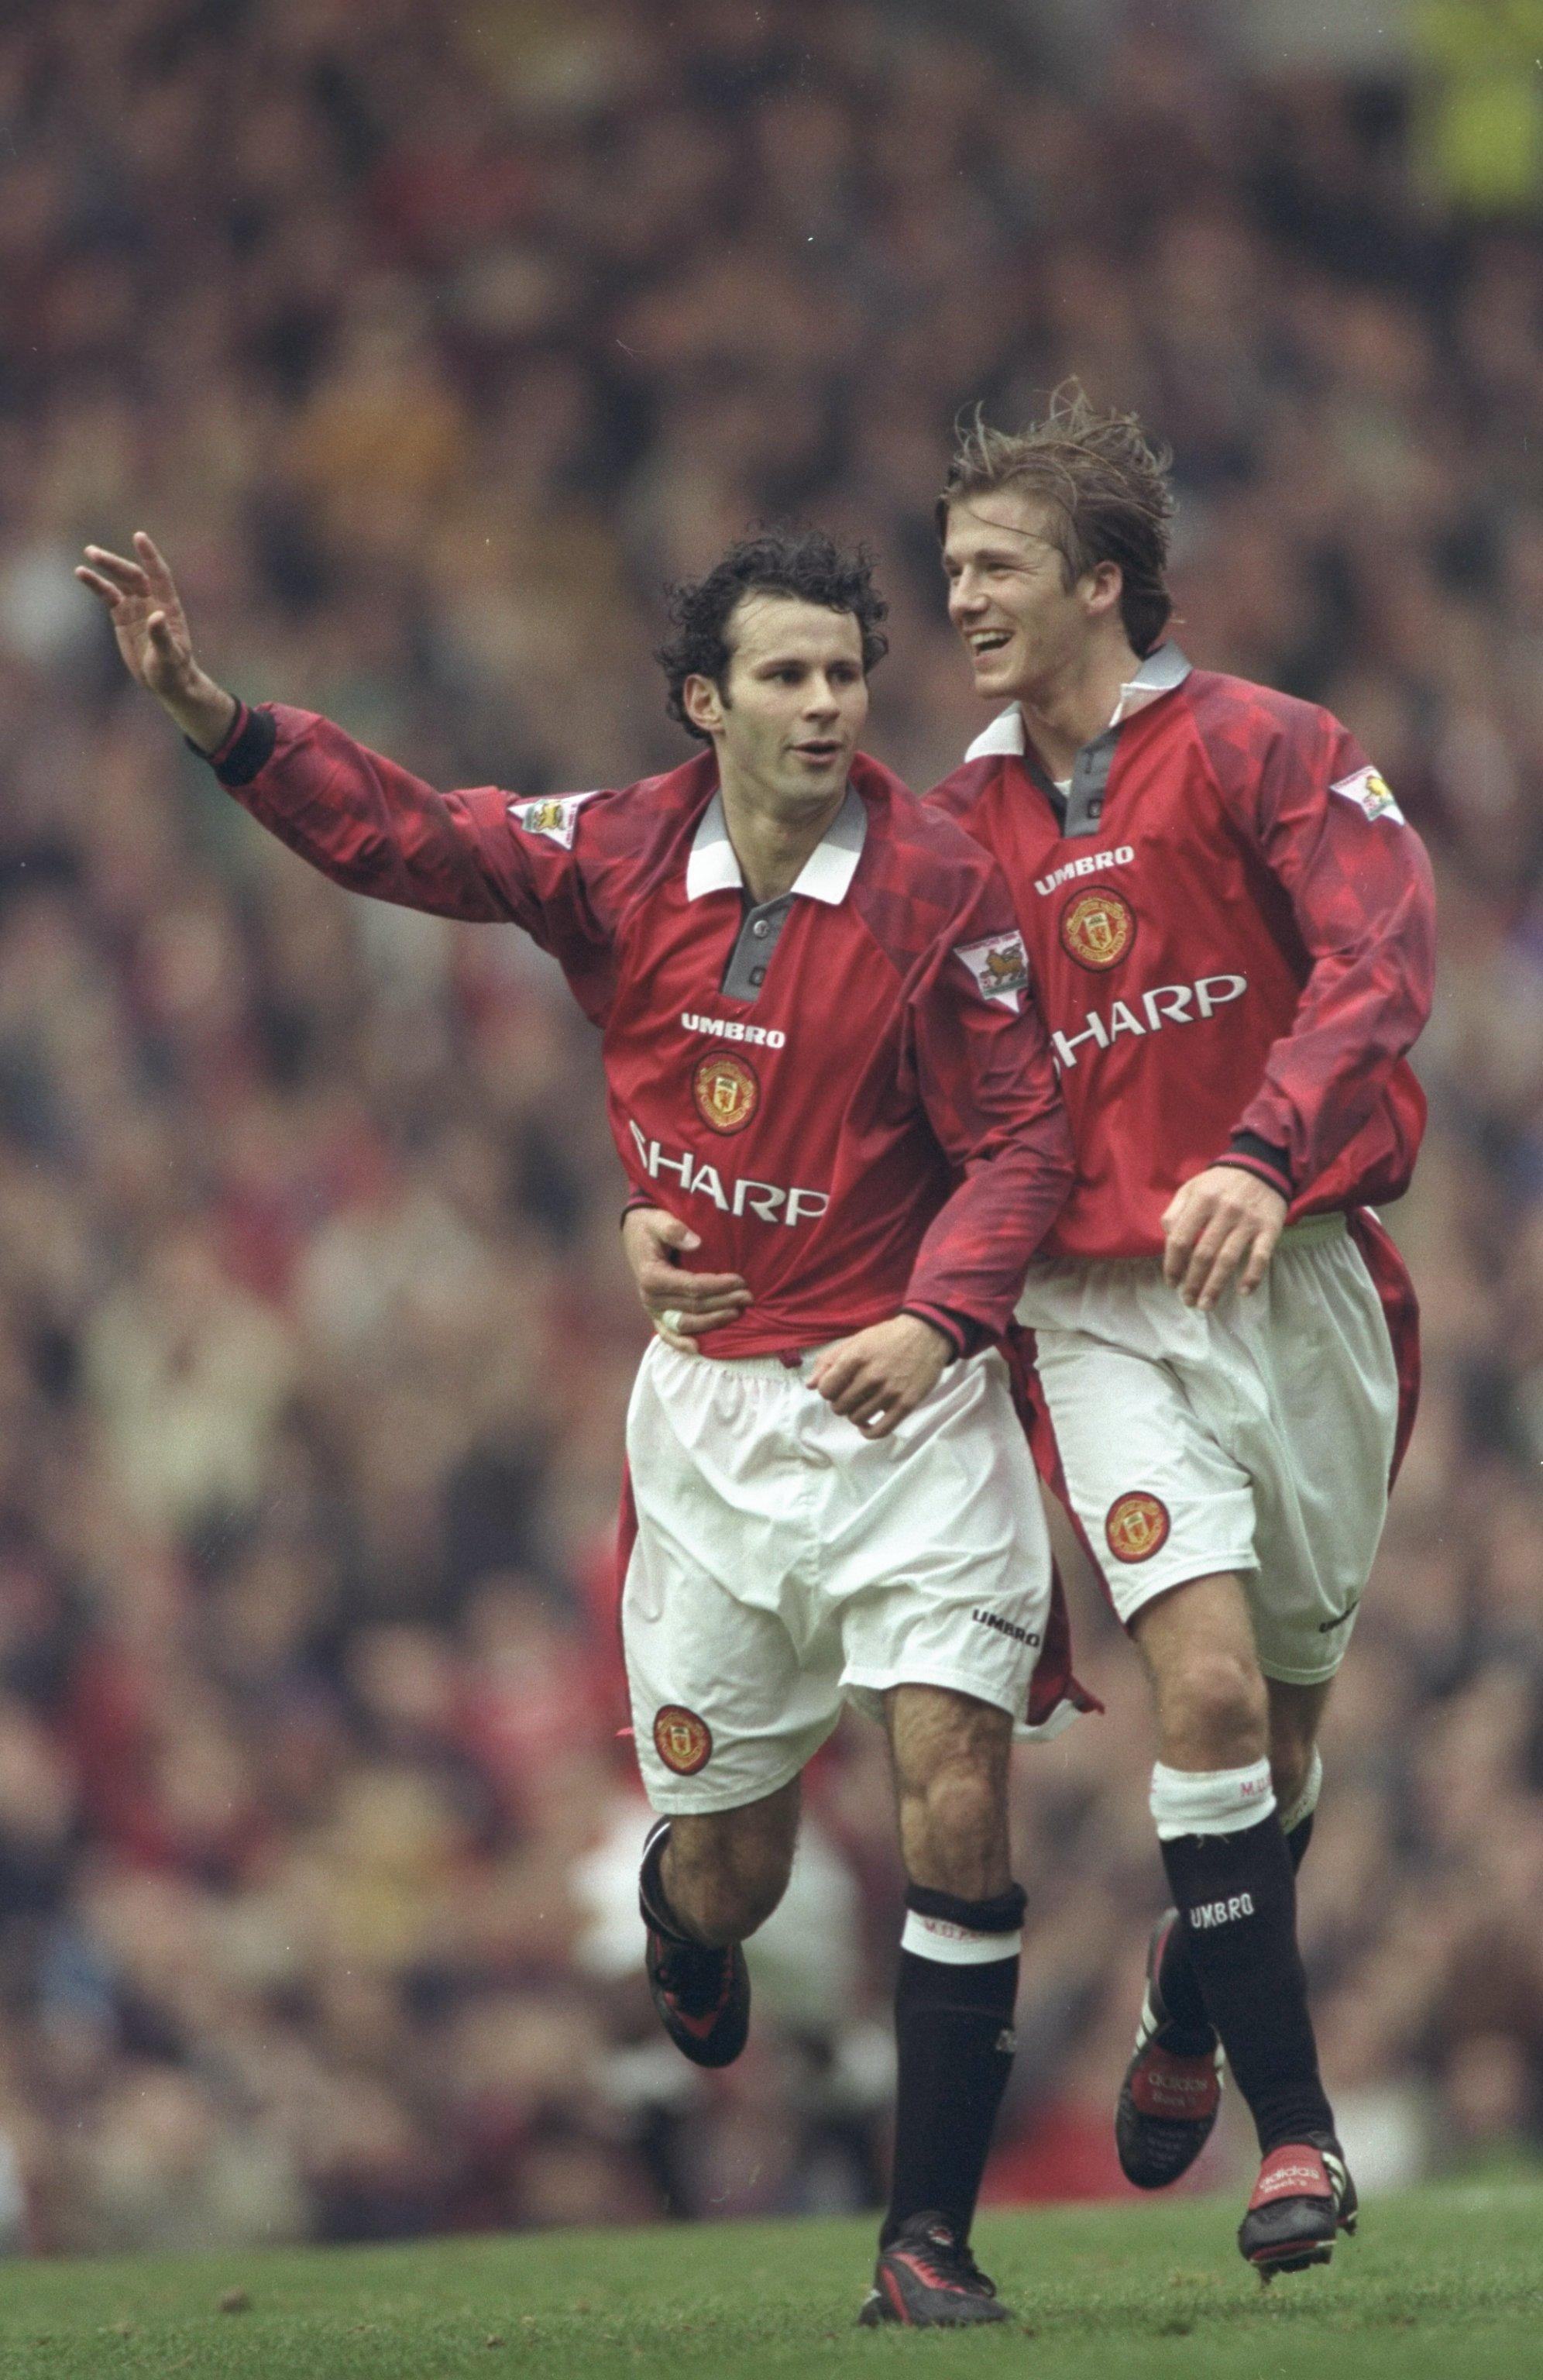 Manchester United's Ryan Giggs (left) and David Beckham (right), 1997-98. (Allsport UK /Allsport)